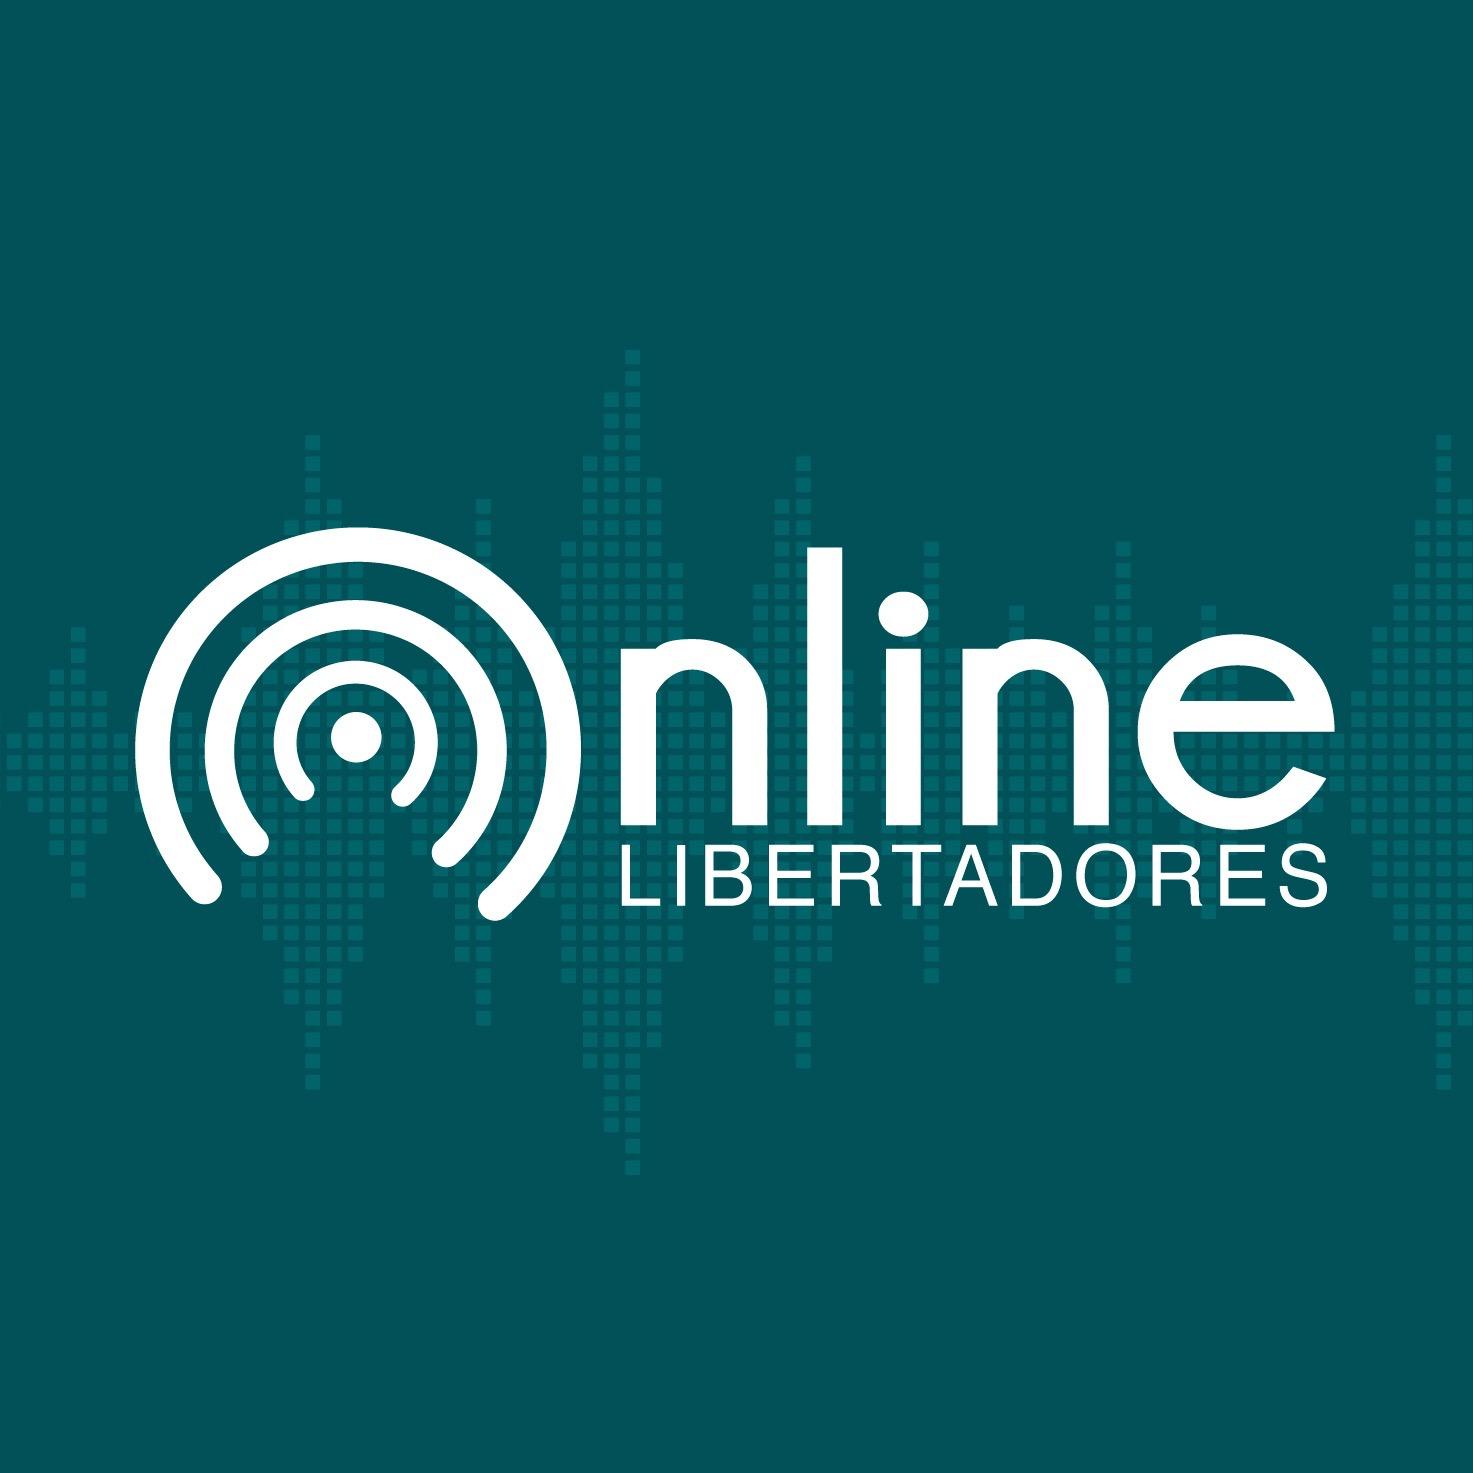 ZONA LIBRE - Steven Salcedo